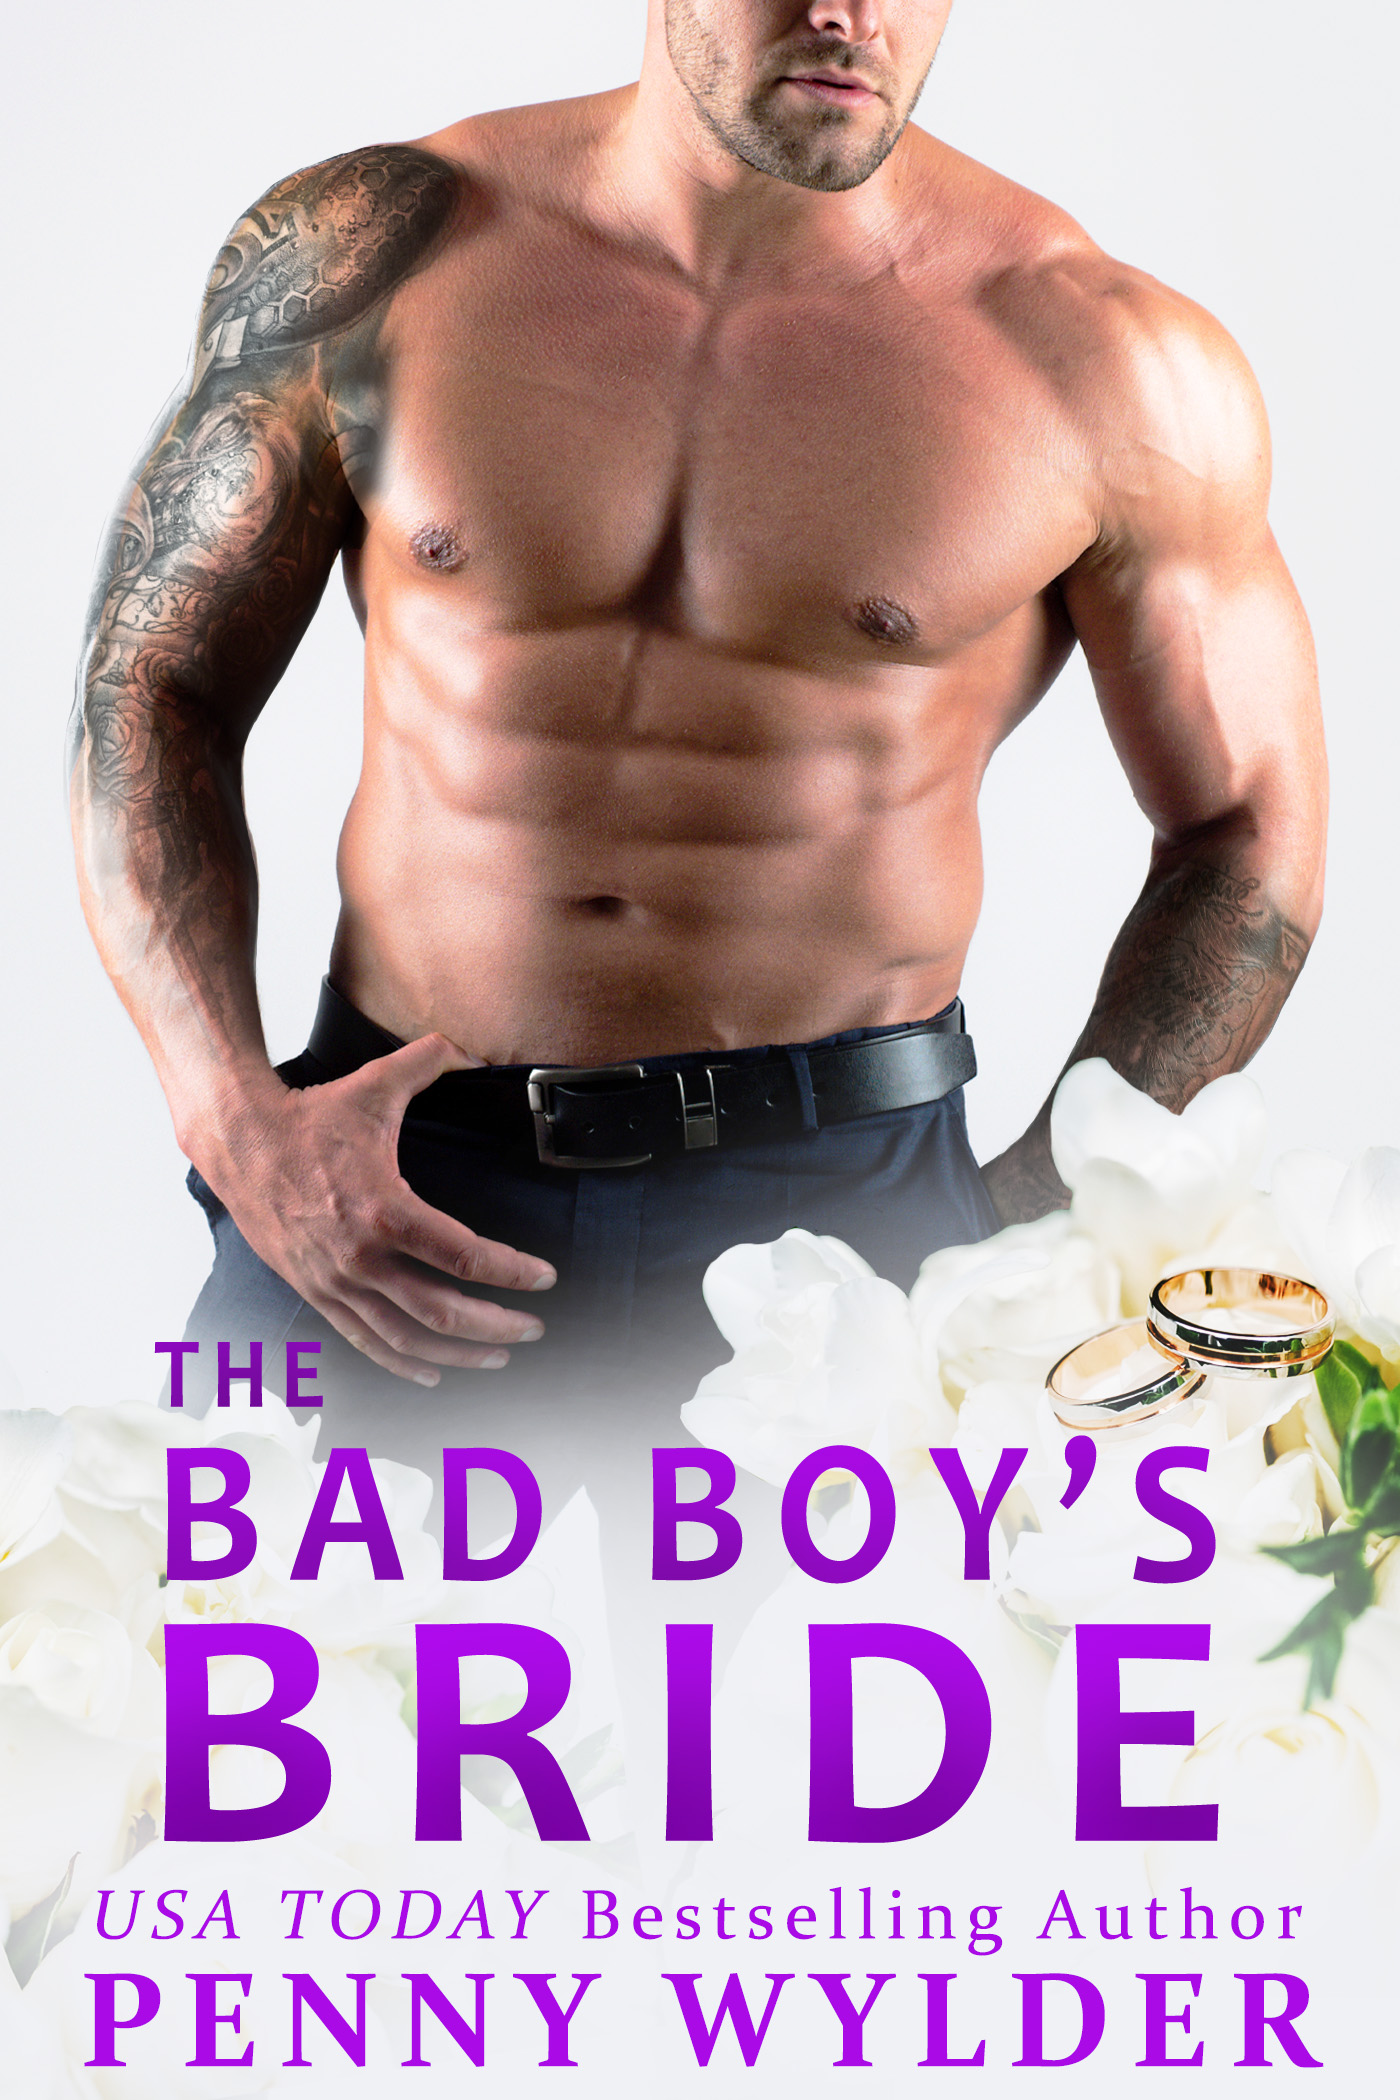 The Bad Boy's Bride (Big Men Small Towns #2)